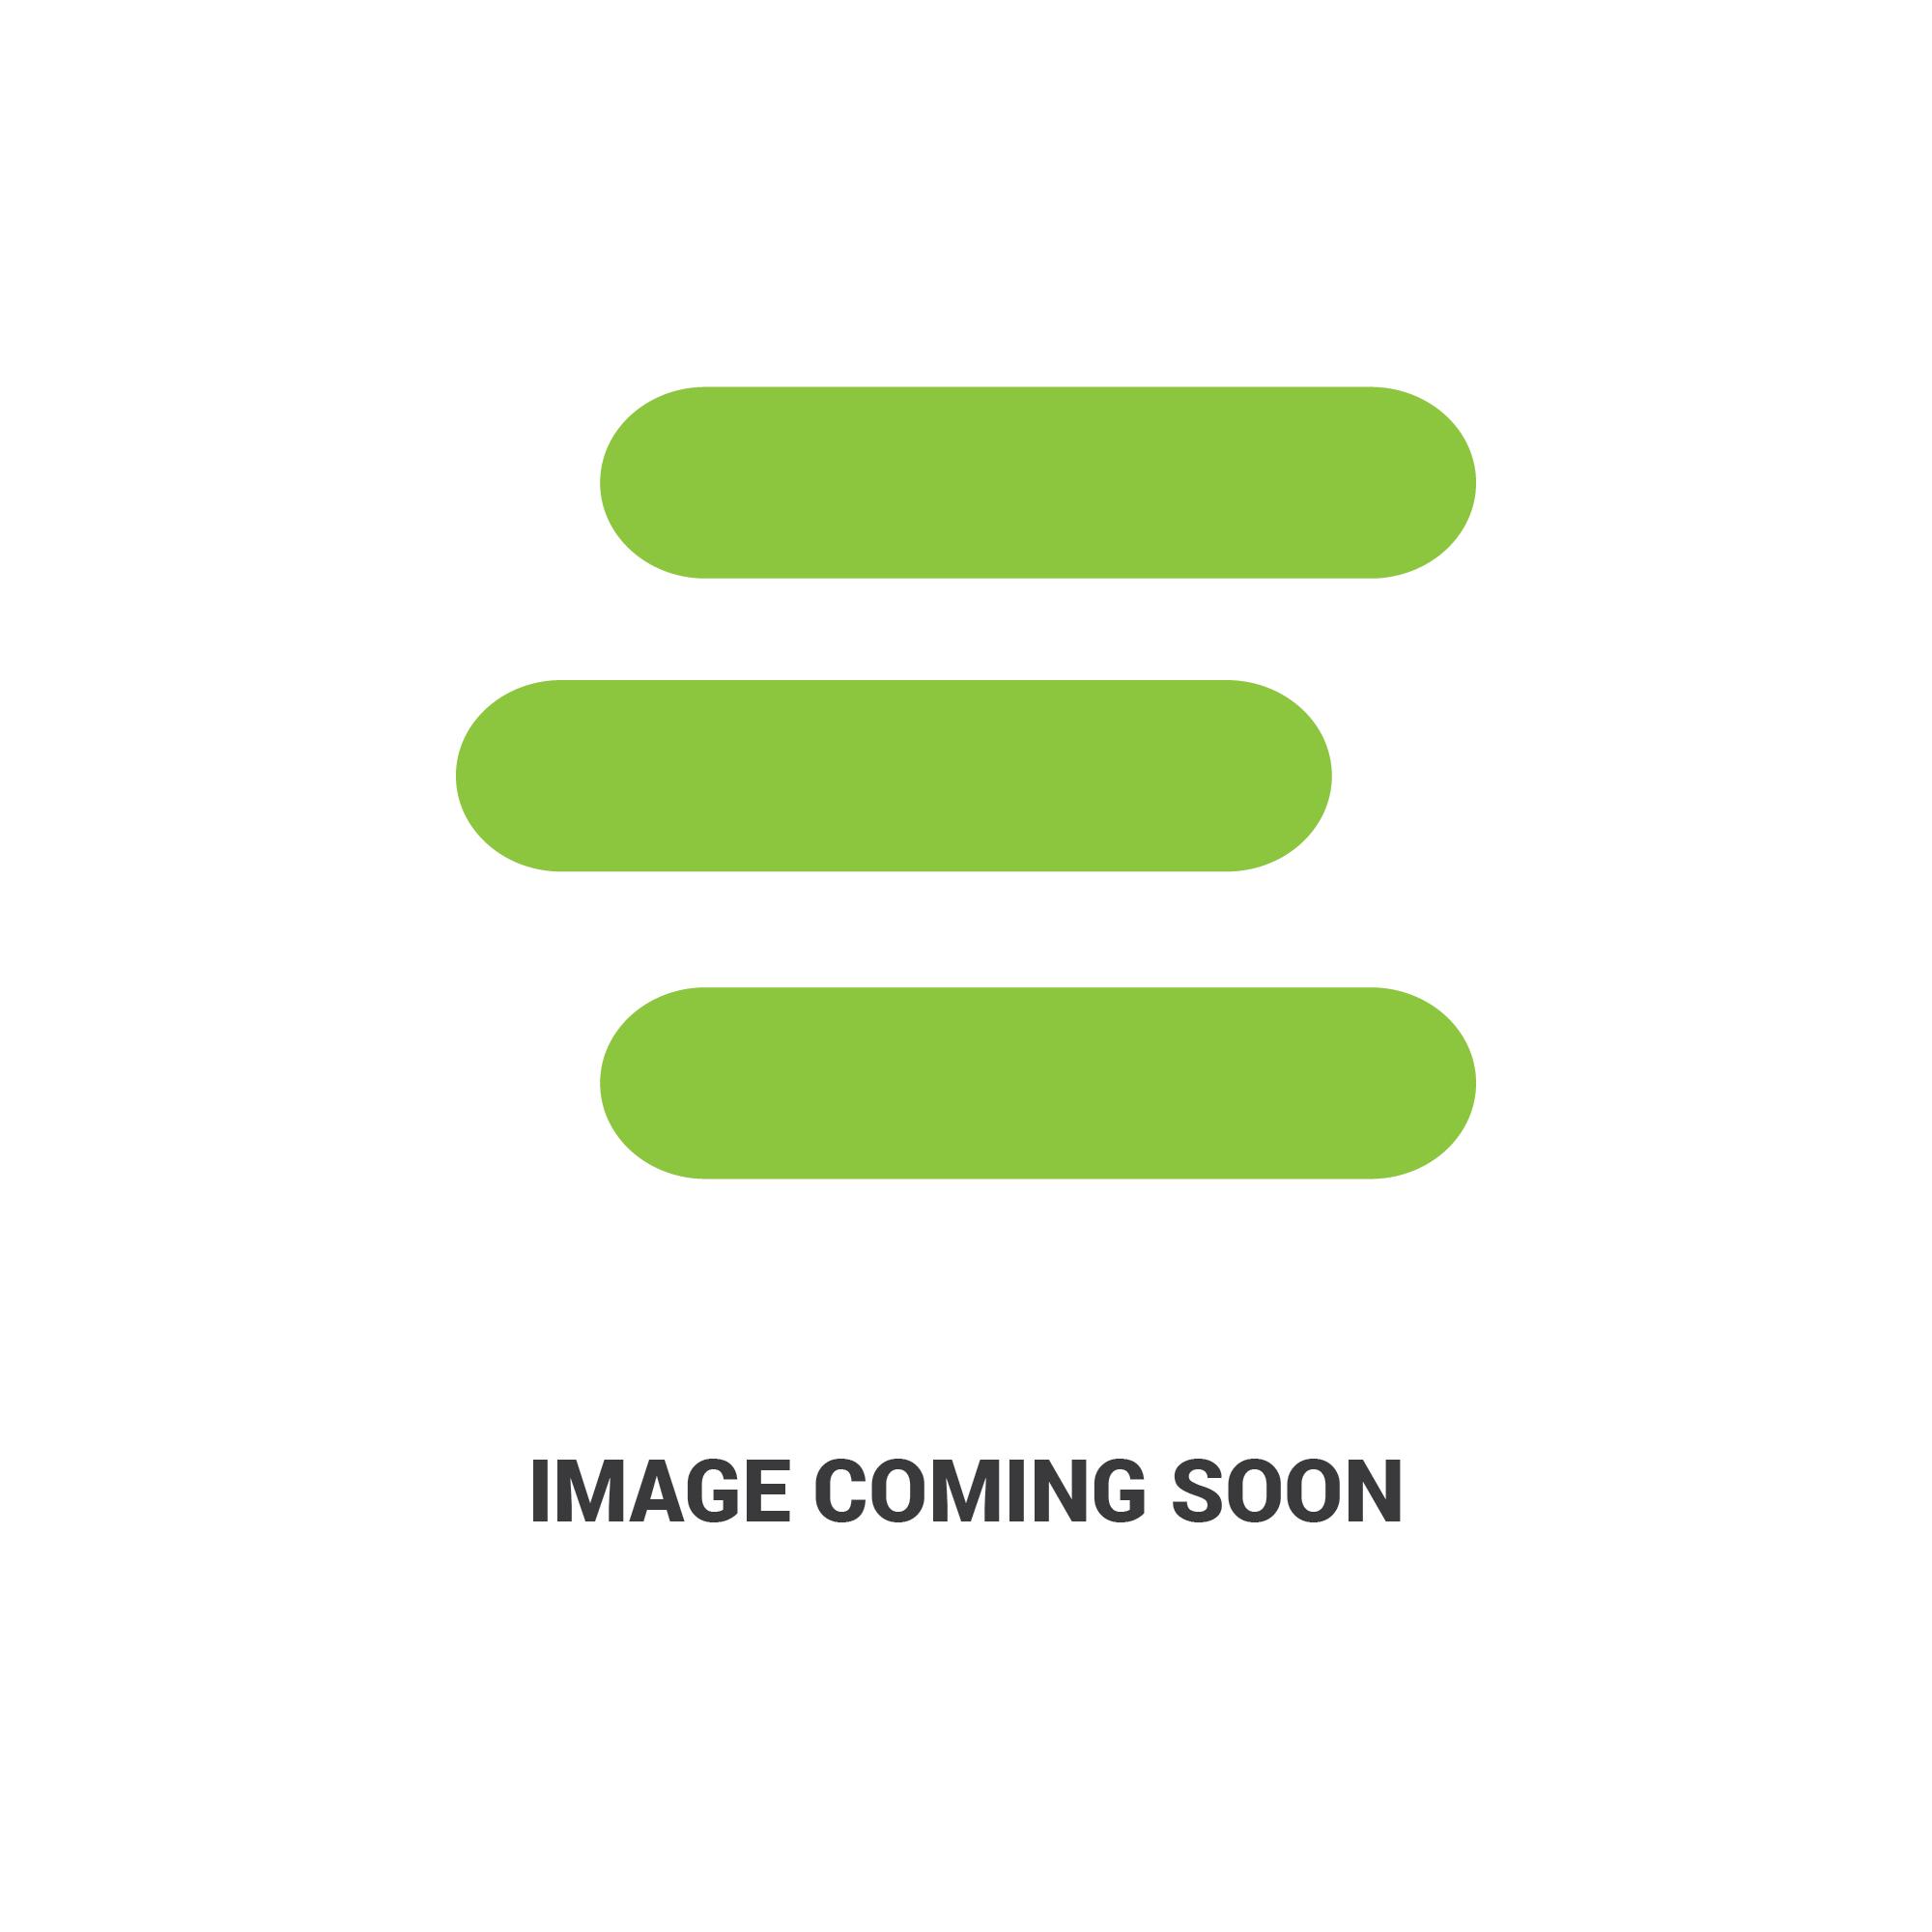 E-6730819edit 2.jpg